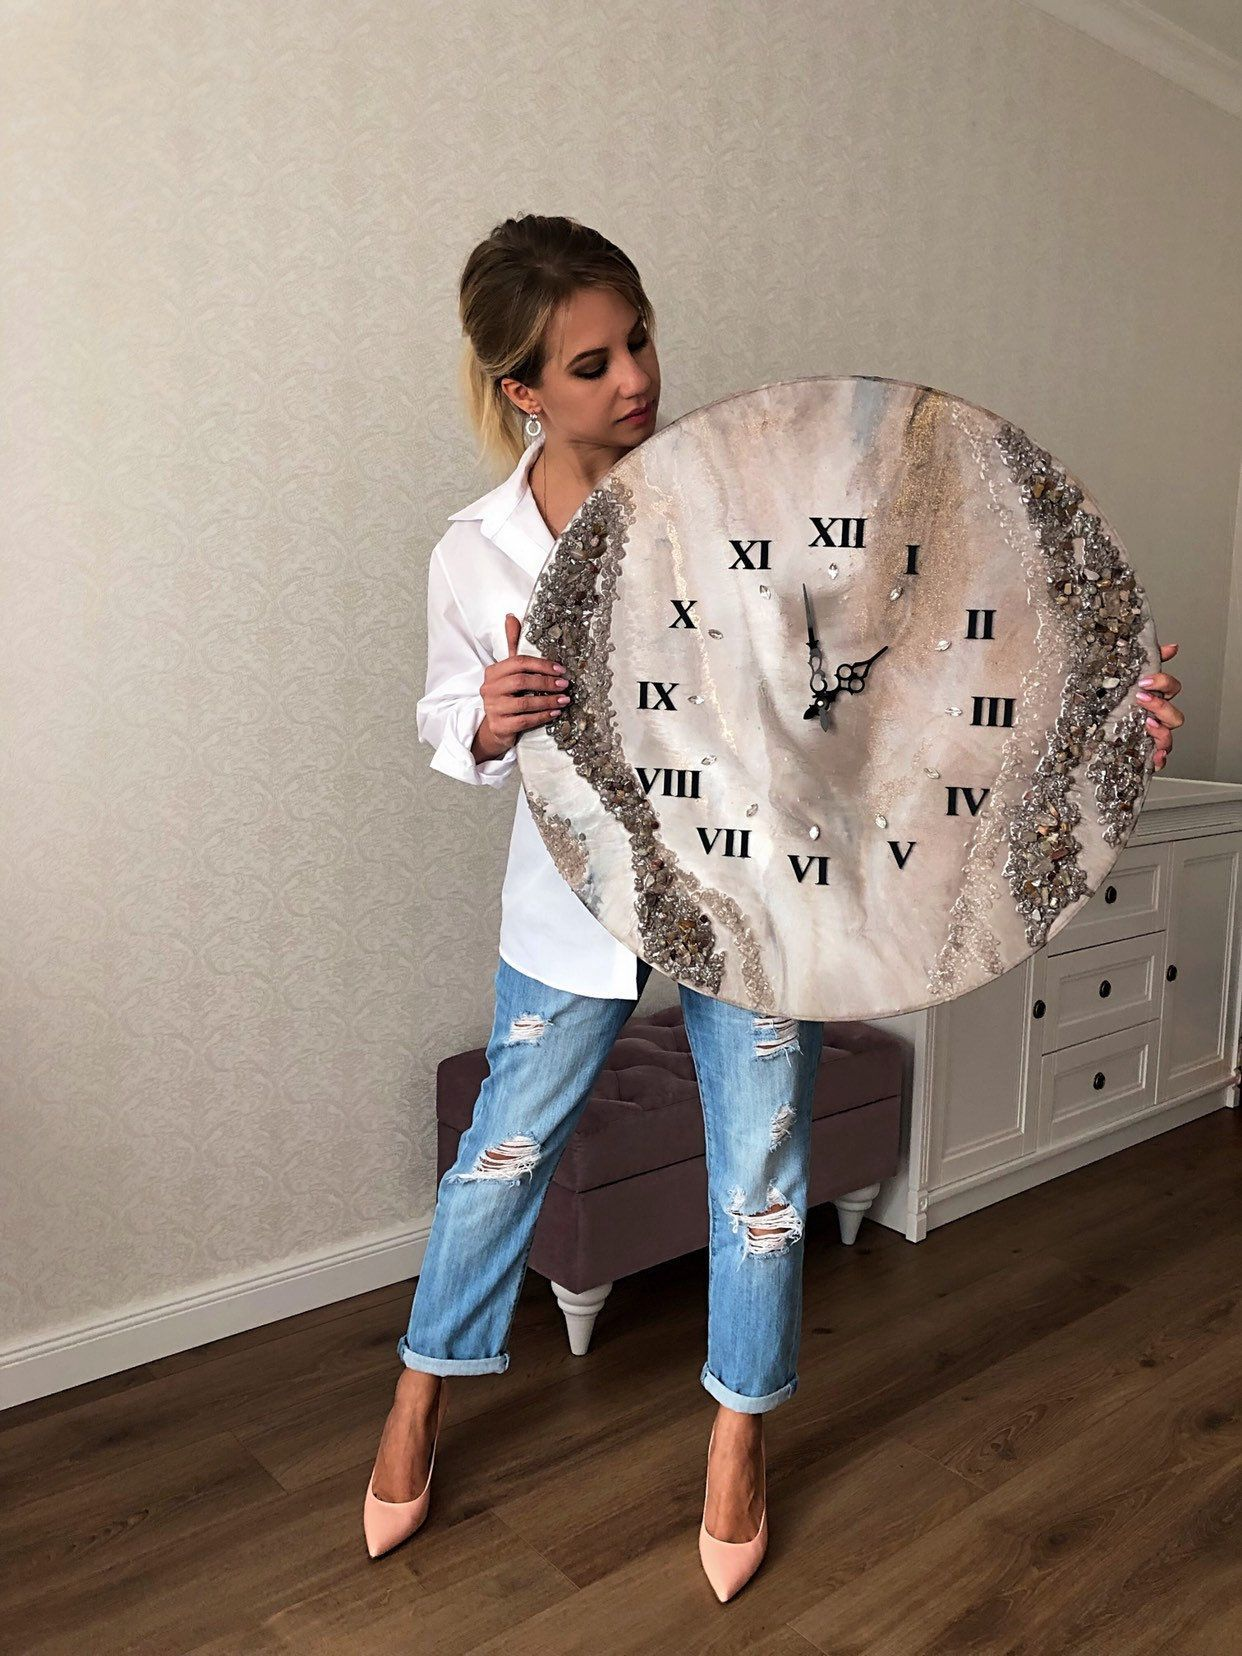 Wall Clock - Home Decor - Large Clock - Modern Design - Epoxy Decor - Housewarming Gift - Epoxy Resin Art Wall Decor - Unique Watch#art #clock #decor #design #epoxy #gift #home #housewarming #large #modern #resin #unique #wall #watch